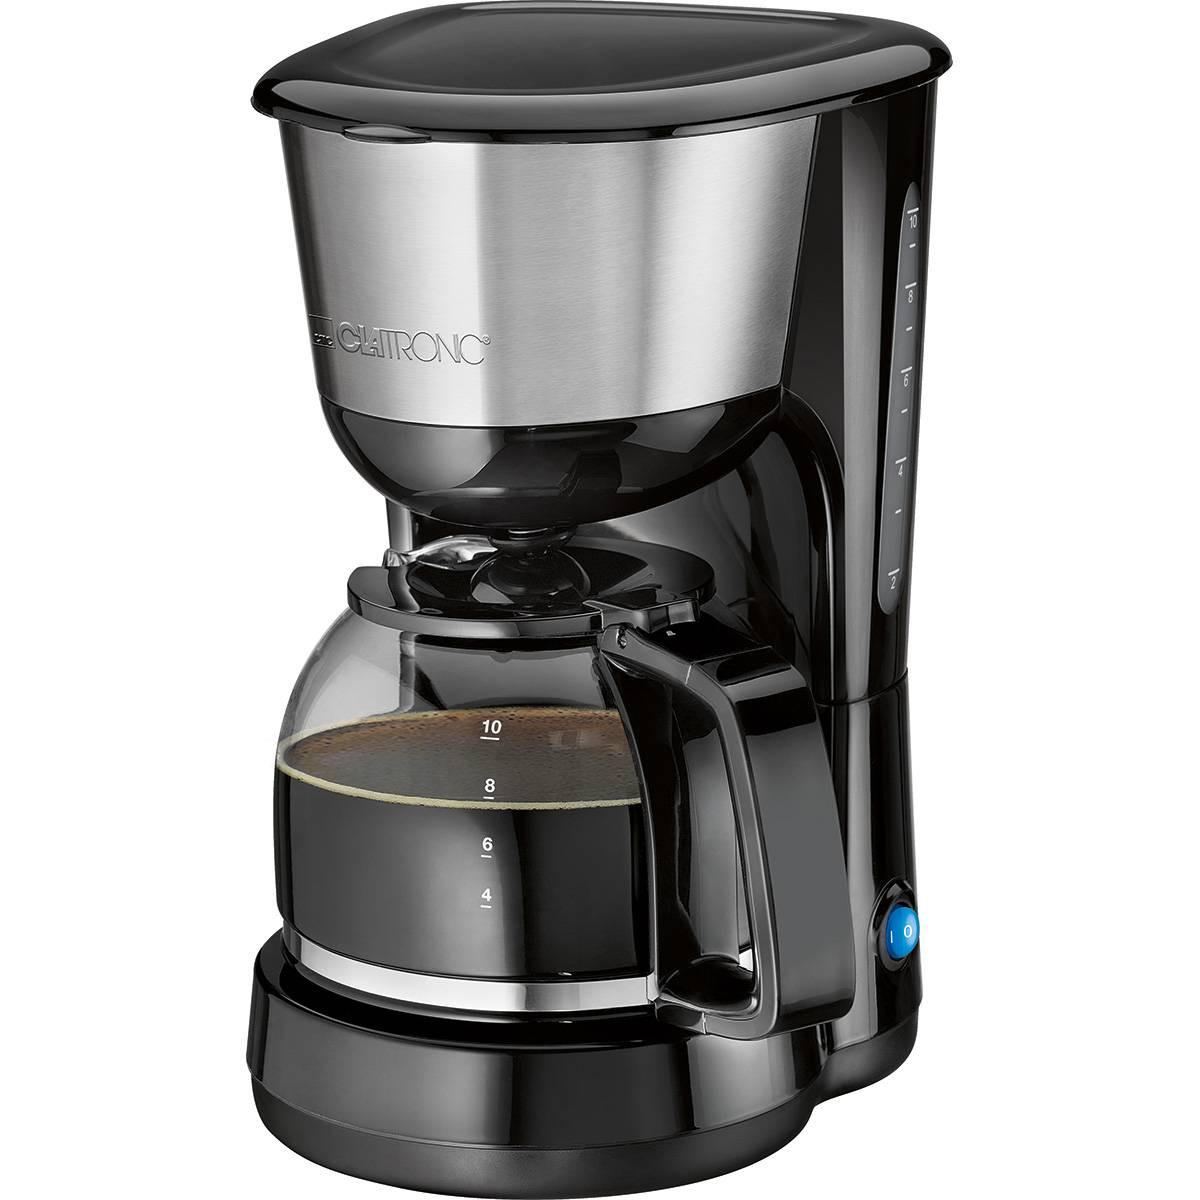 Clatronic KA 3575 - Cafetera de goteo, capacidad de 8 a 10 tazas, 1,25 l, 1000 W, color negro y plata